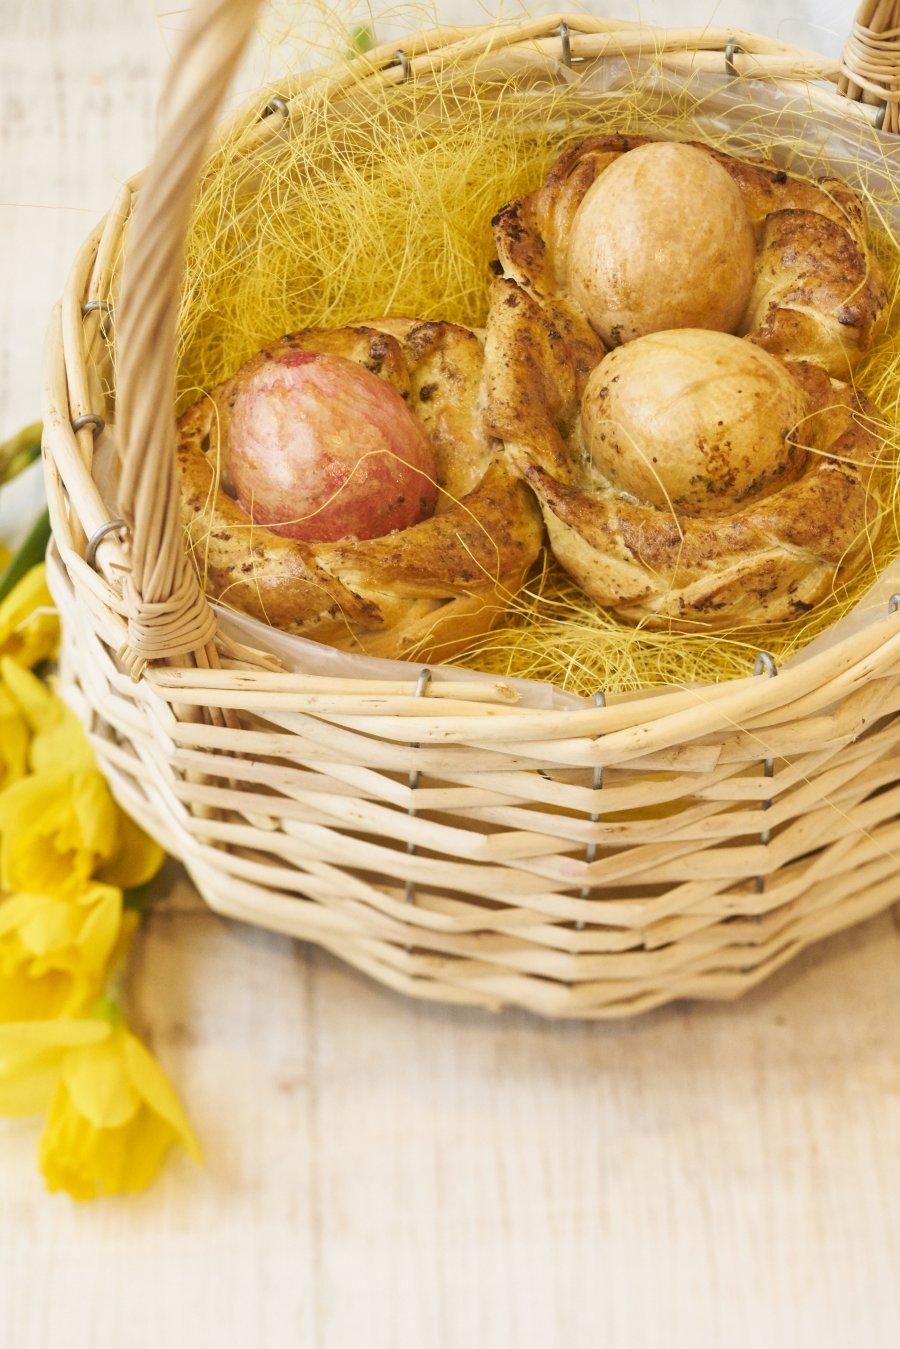 Pizzabroodjes met gekleurde eieren - Pasen - Tante Fanny